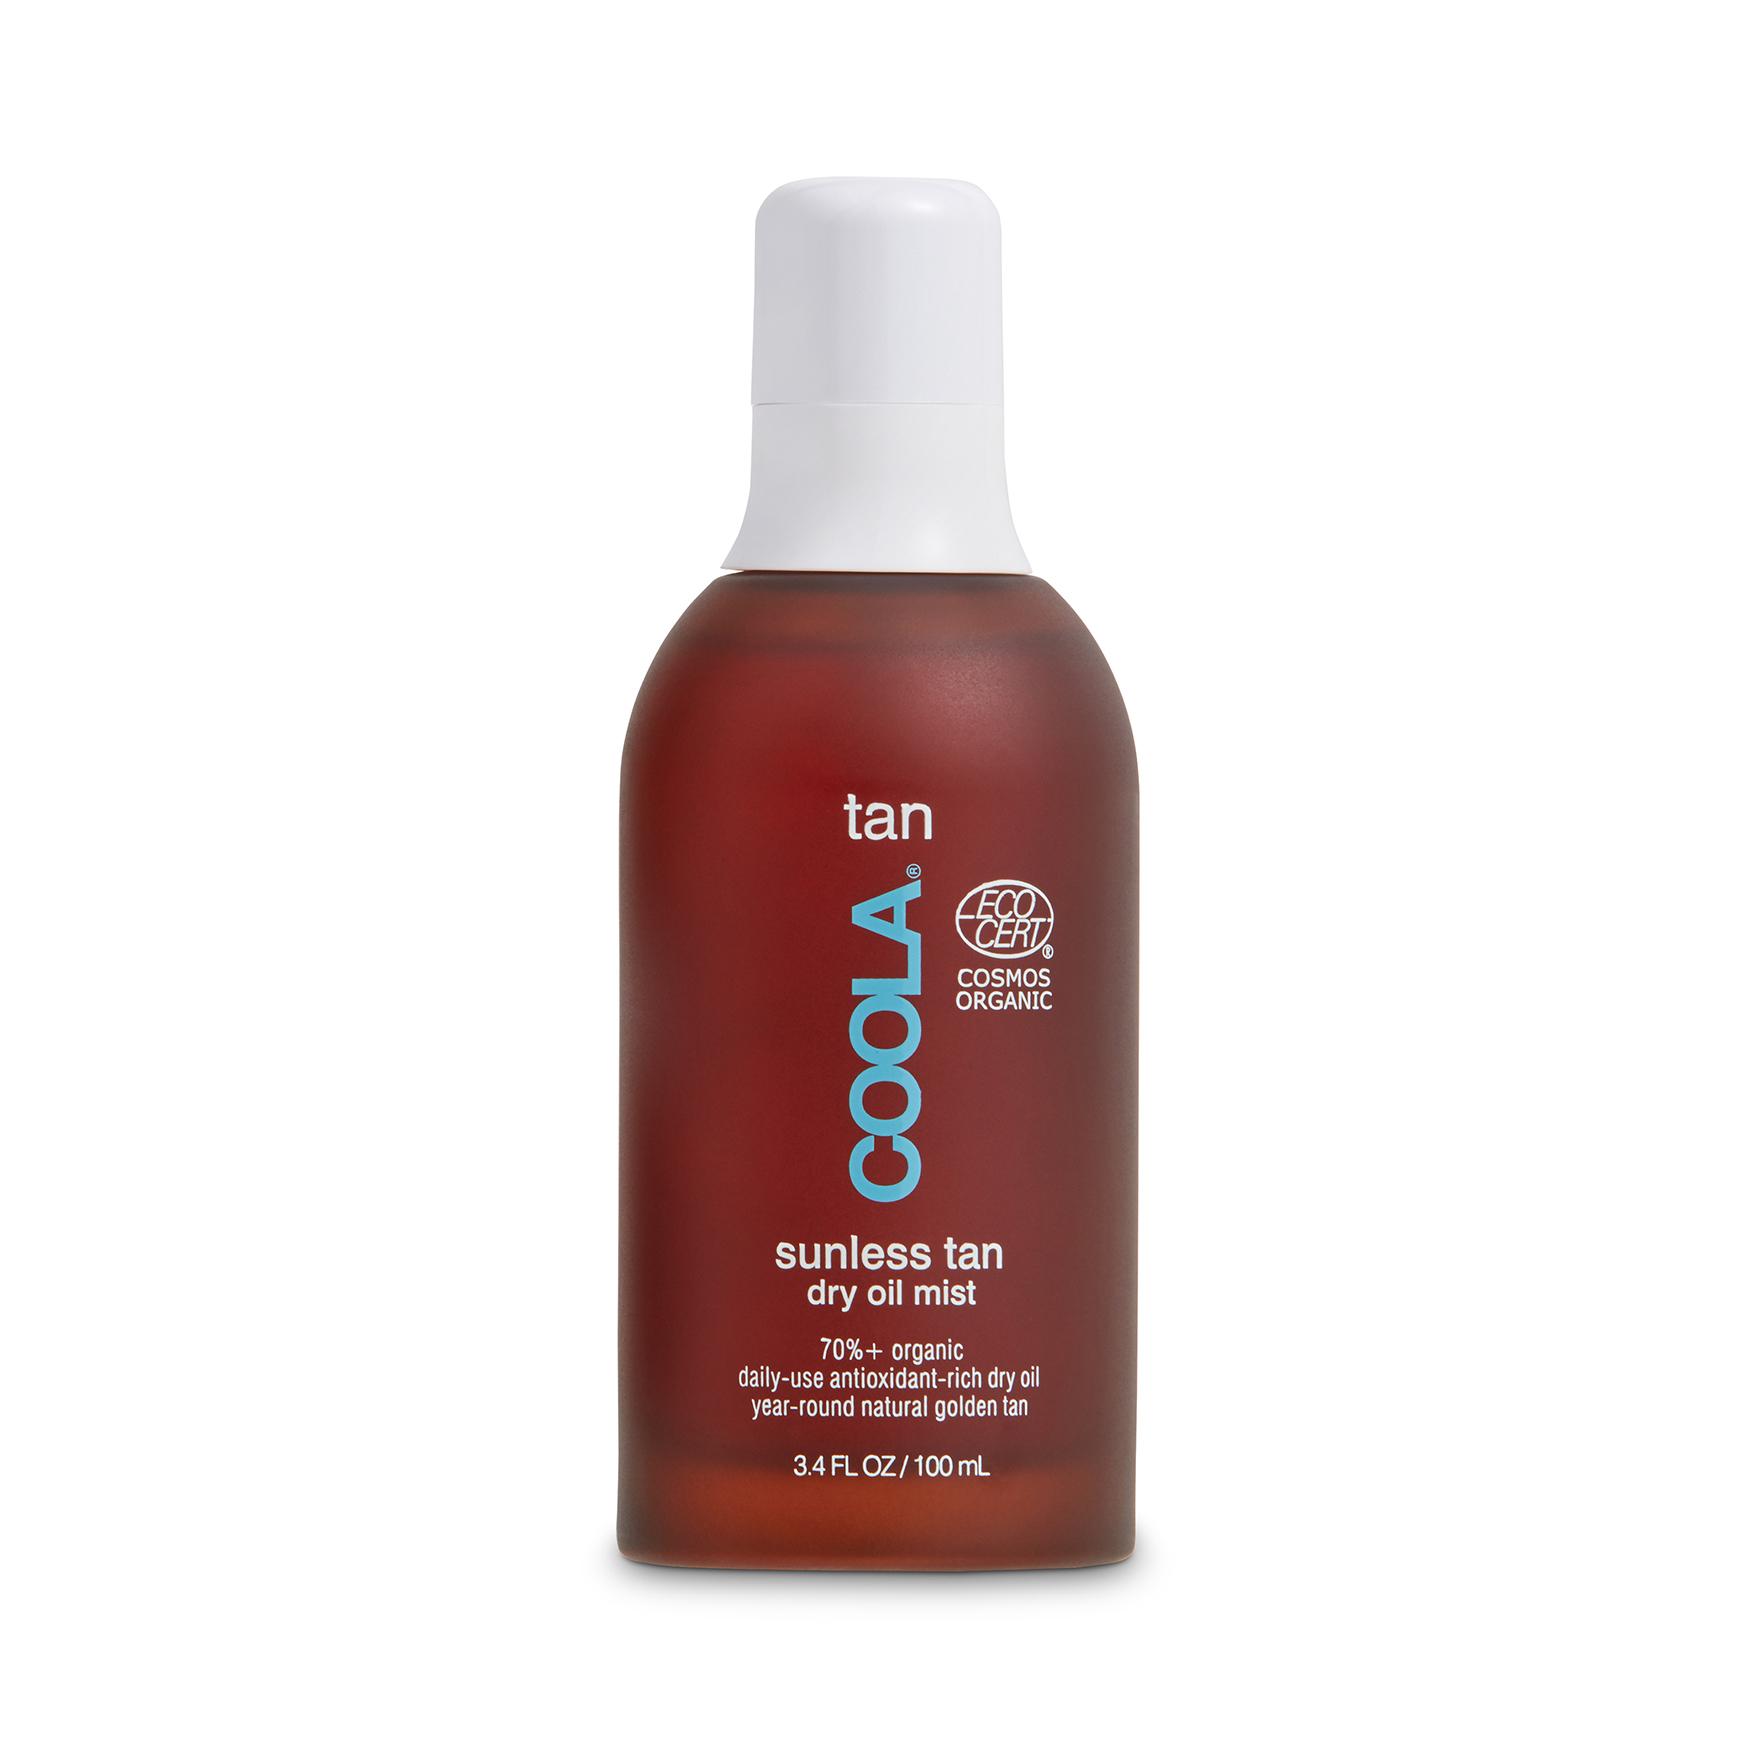 Organic Sunless Tan Dry Oil Mist, , large